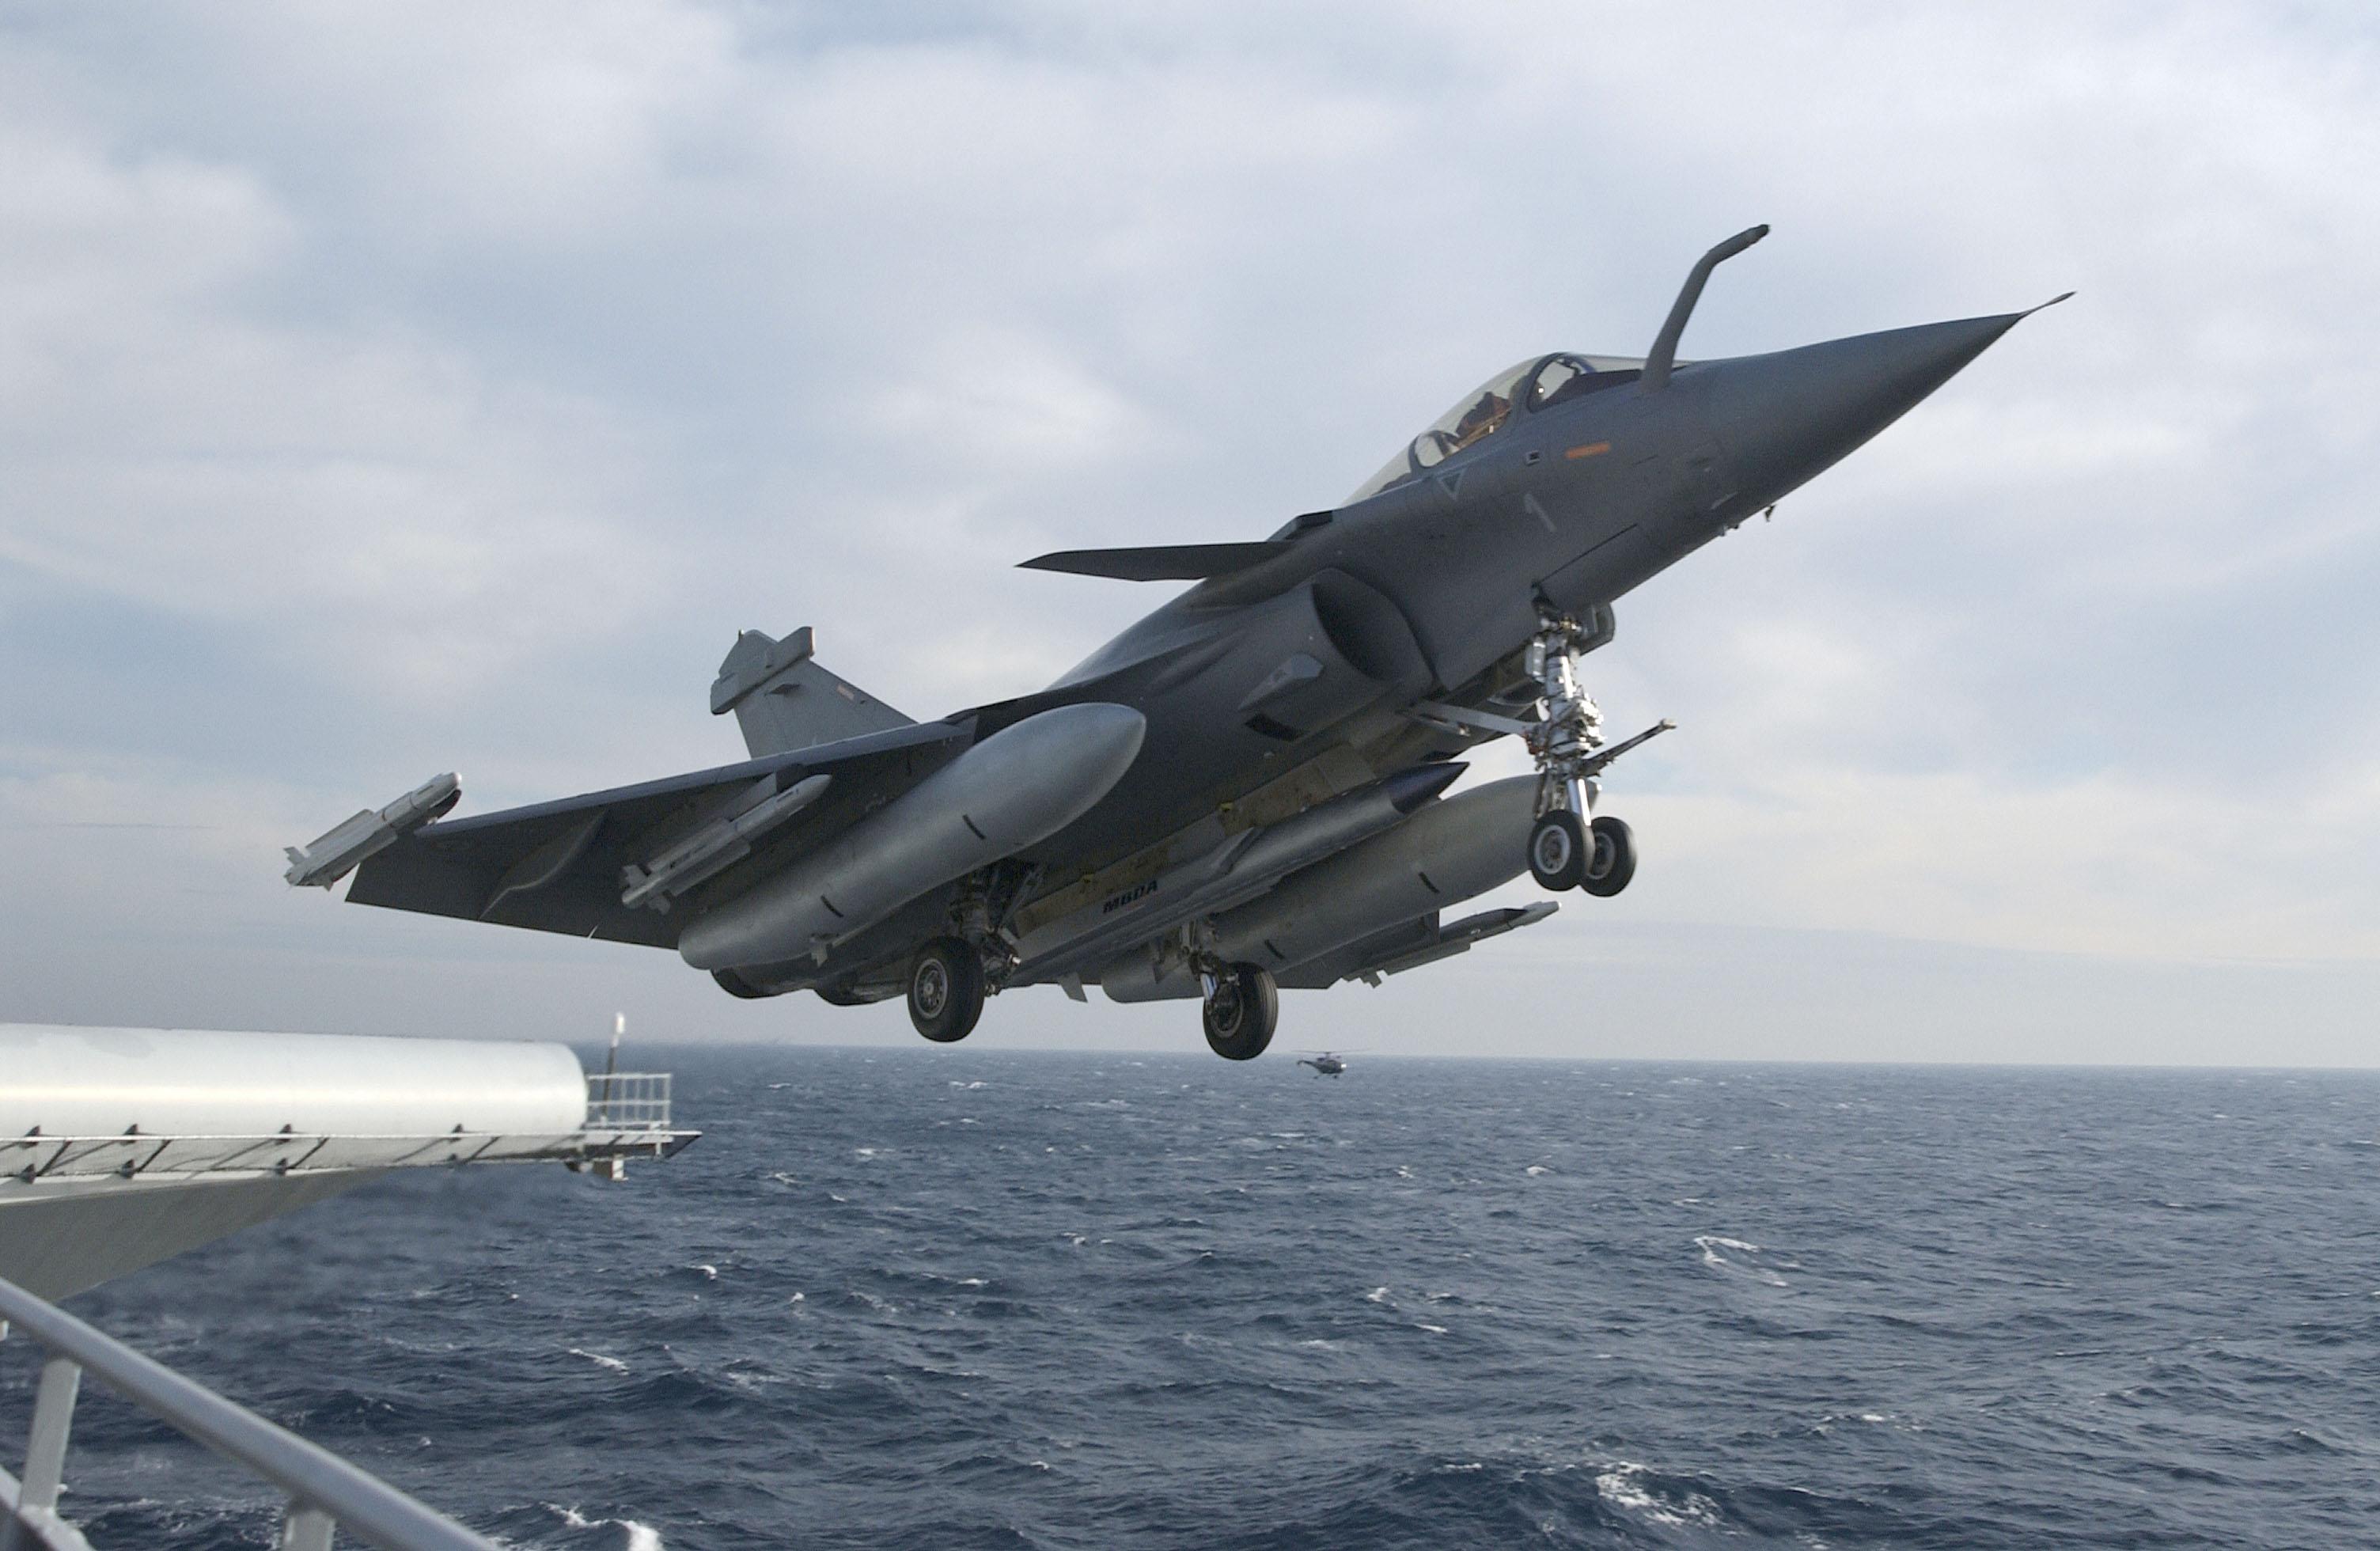 Rafale e asmpa4 - foto Dassault e MBDA